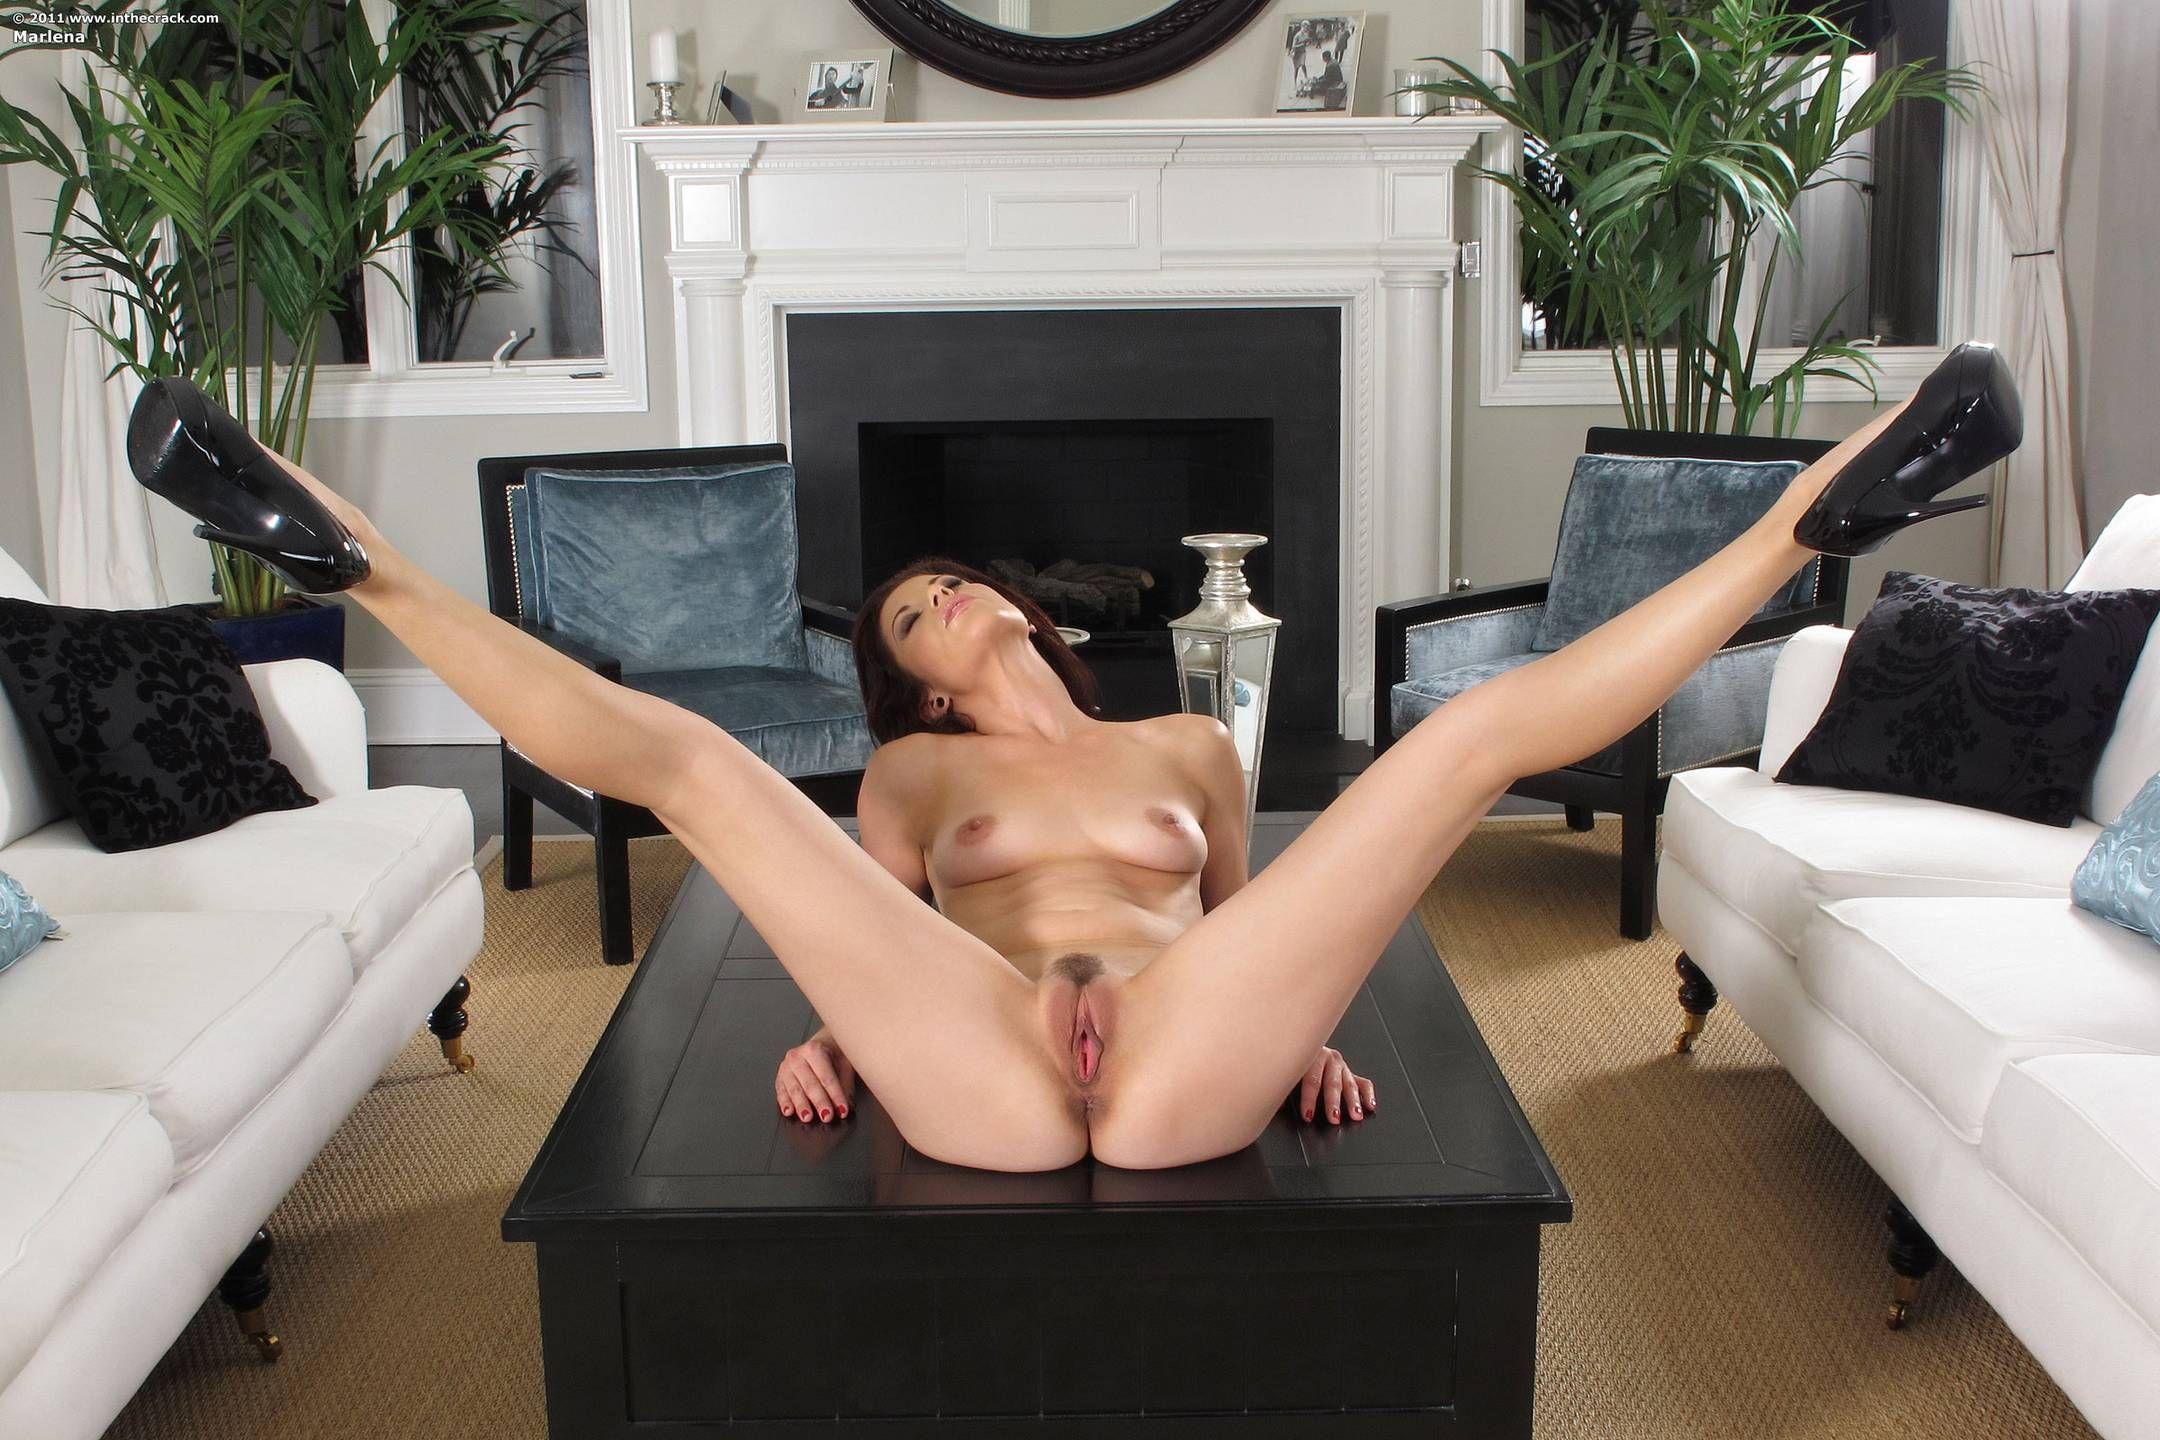 smotret-porno-foto-devushek-s-razdvinutimi-nogami-massazh-prostati-sperma-porno-video